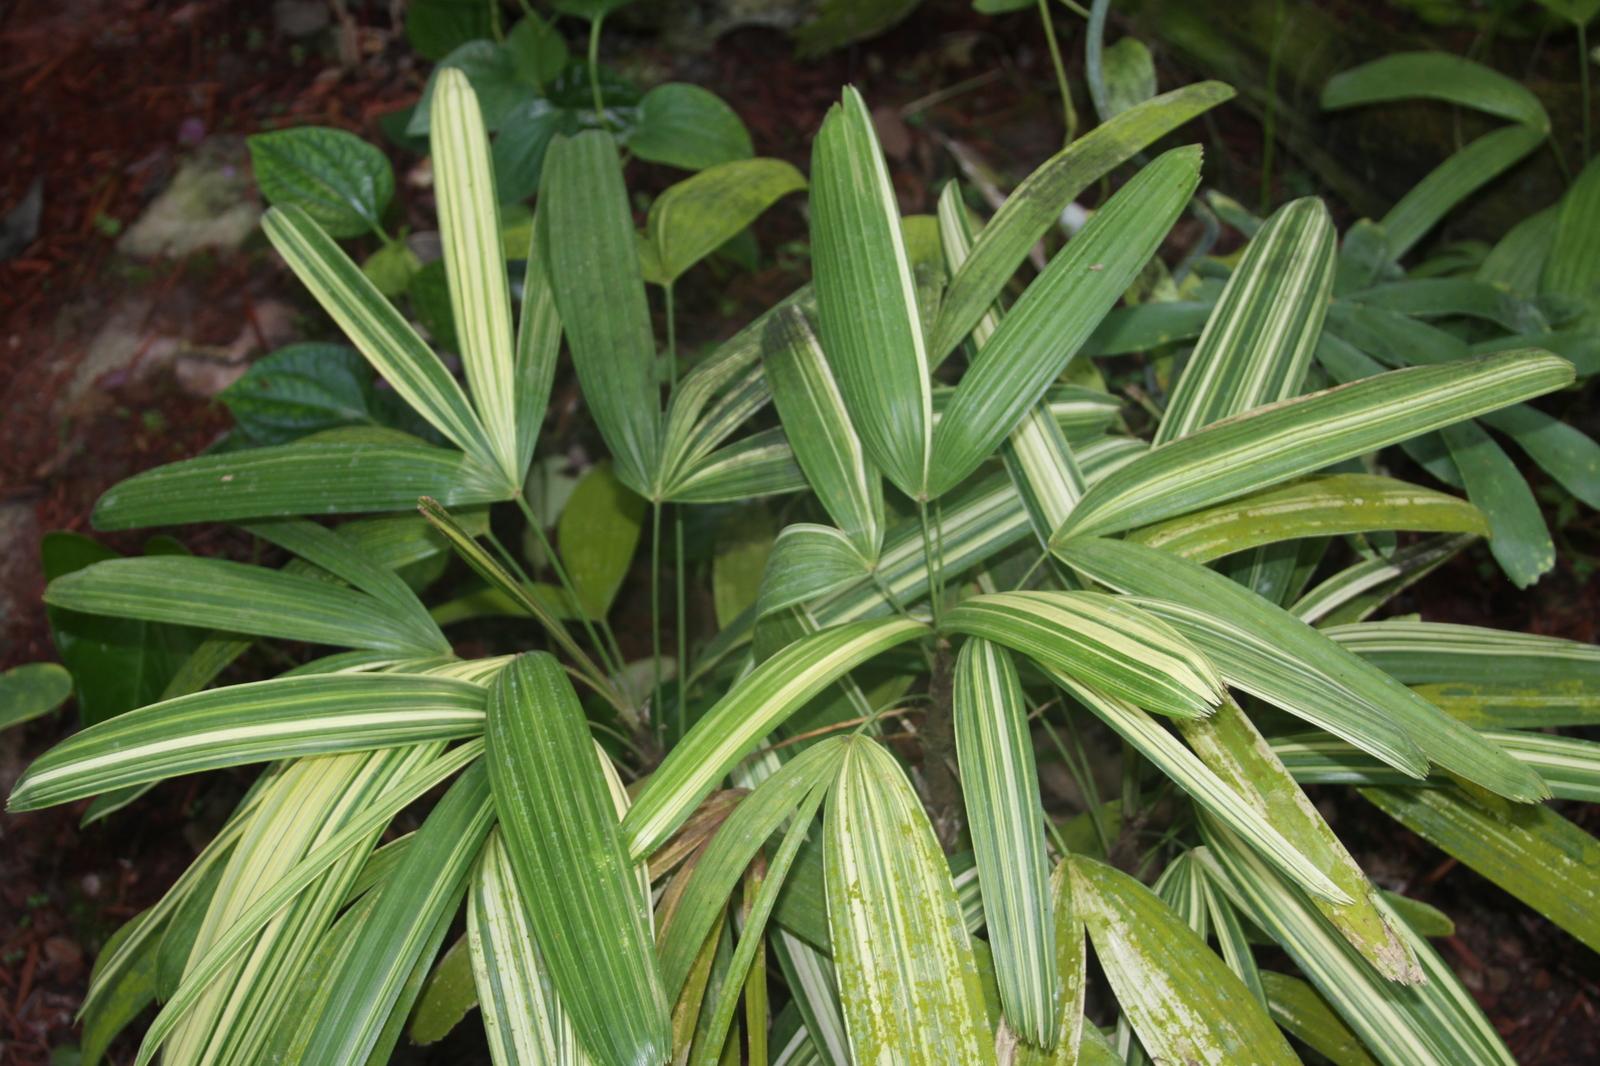 Variegated Rhapis palms